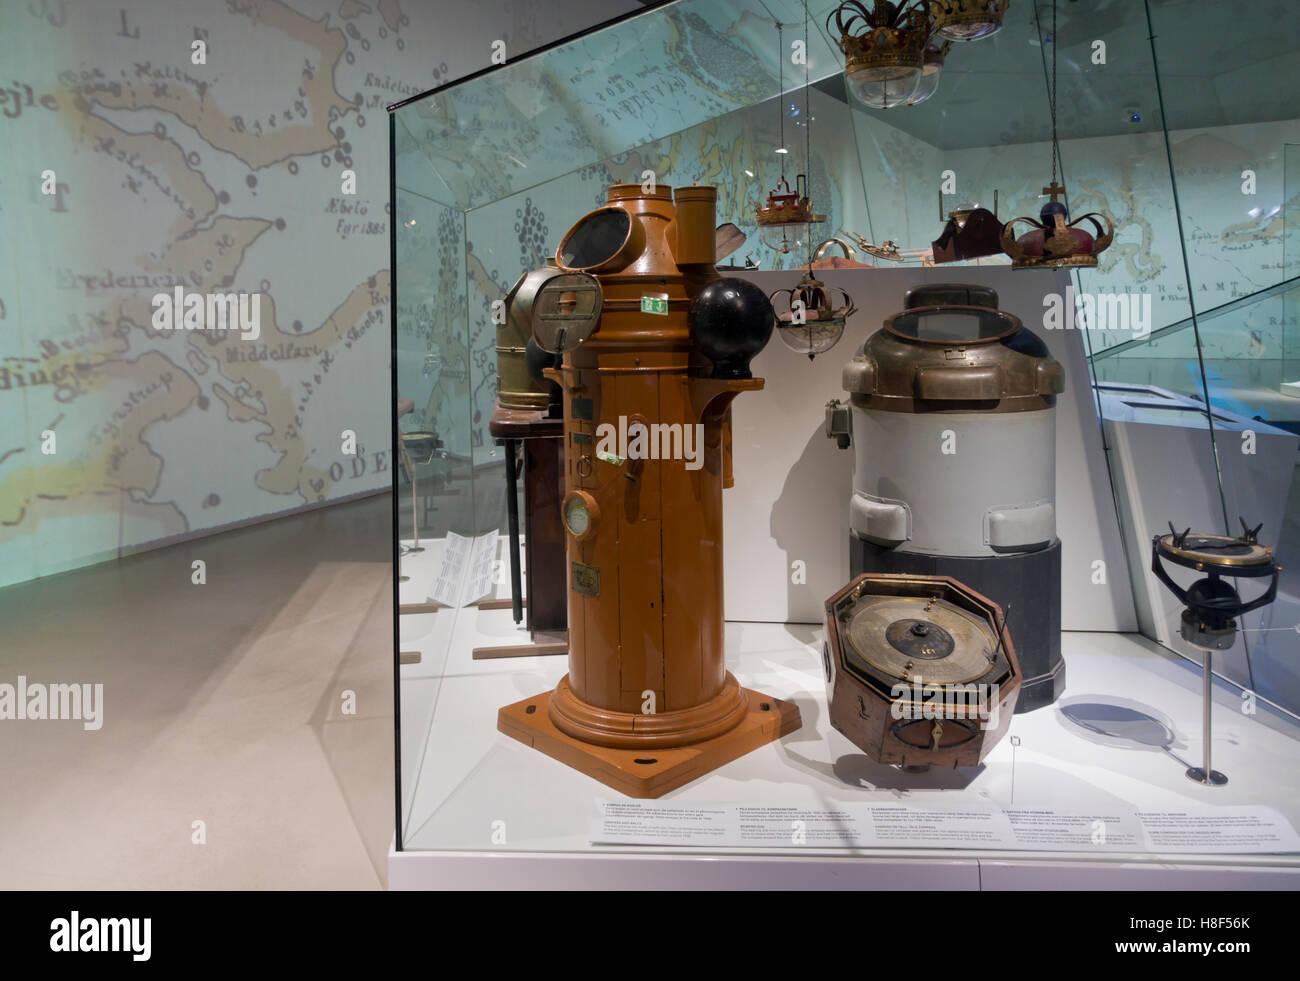 Old binnacles, compasses and nautical equipment at the Danish Maritime Museum (M/S Museet for Søfart) in Elsinore - Stock Image